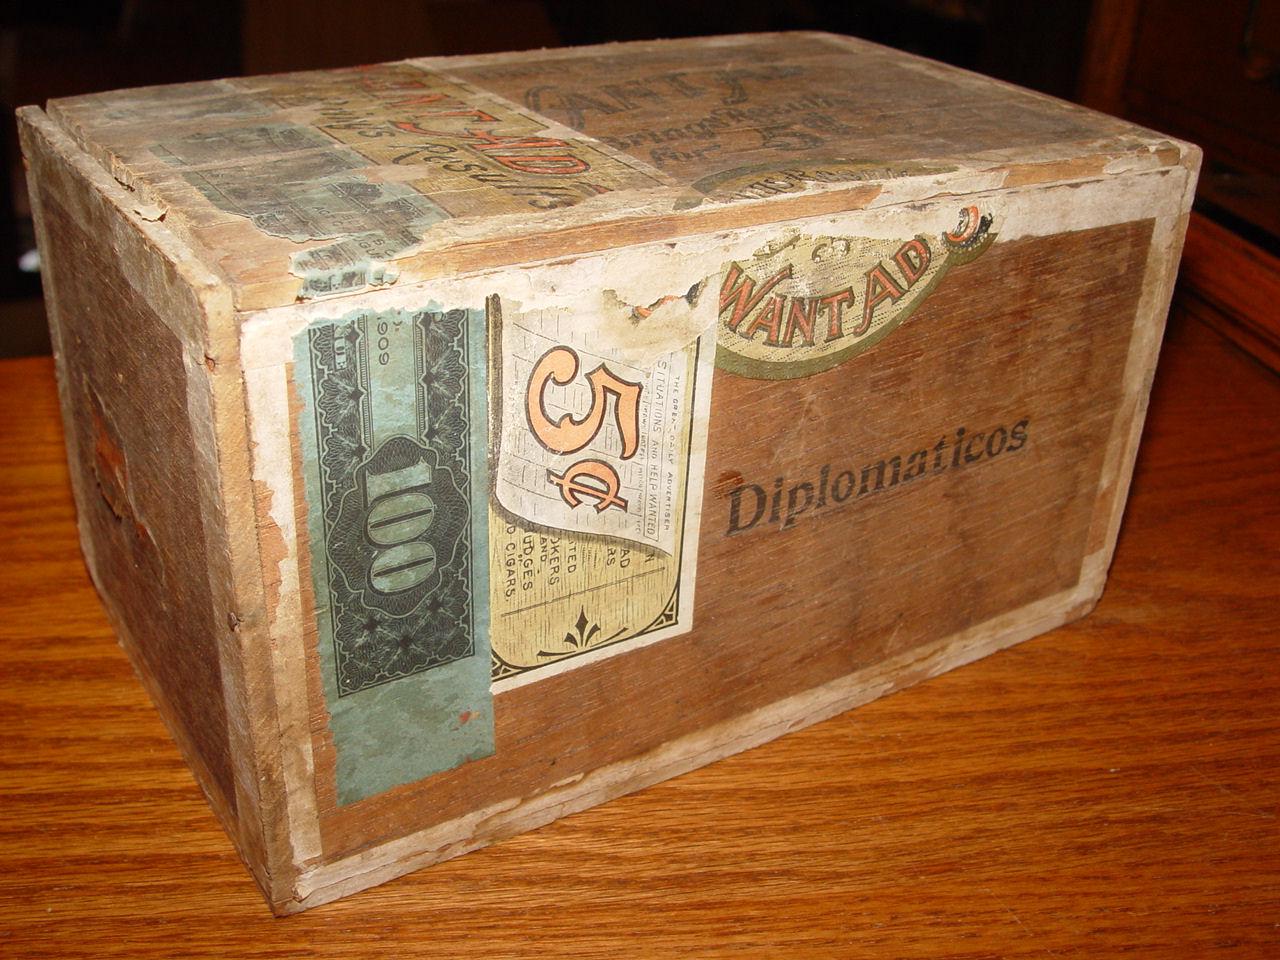 Rare 'Want Ad'                                         Cigars Box, c. 1800's Wooden                                         Cigar Box with Labels ~ Antique                                         Tobacciana